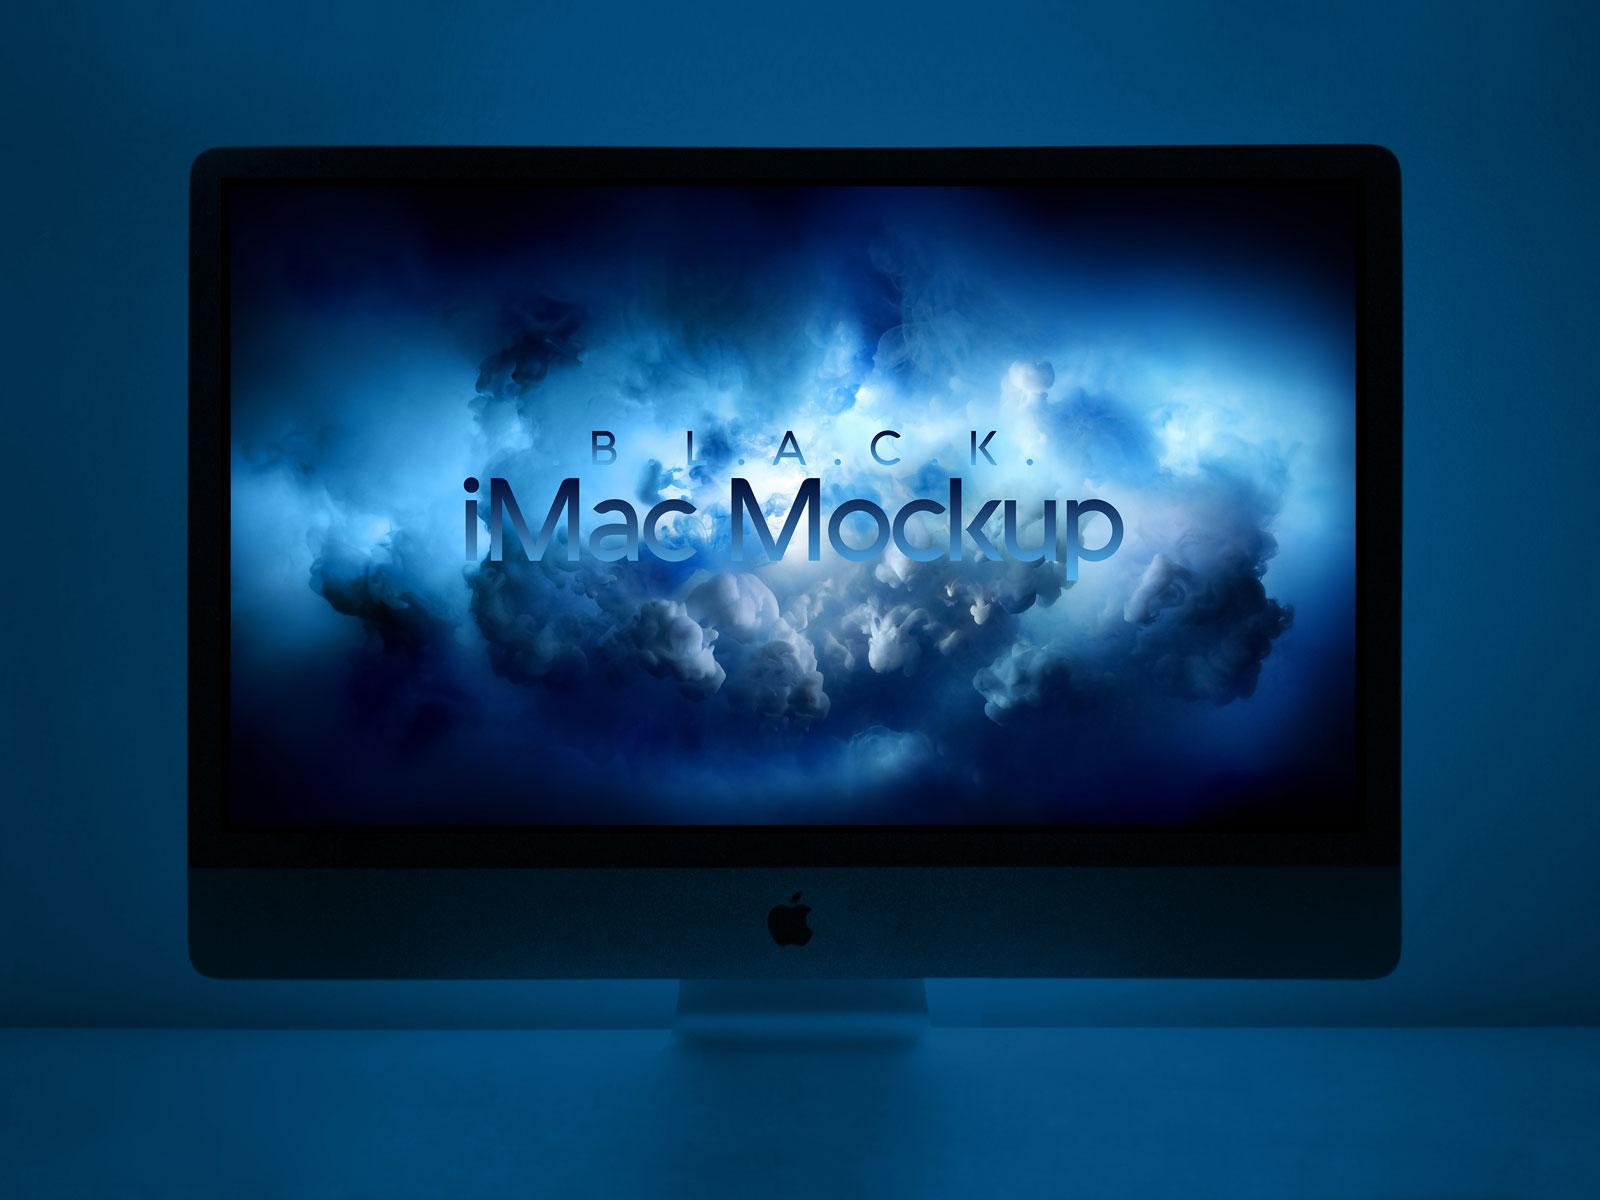 Free-Black-iMac-Mockup-PSD